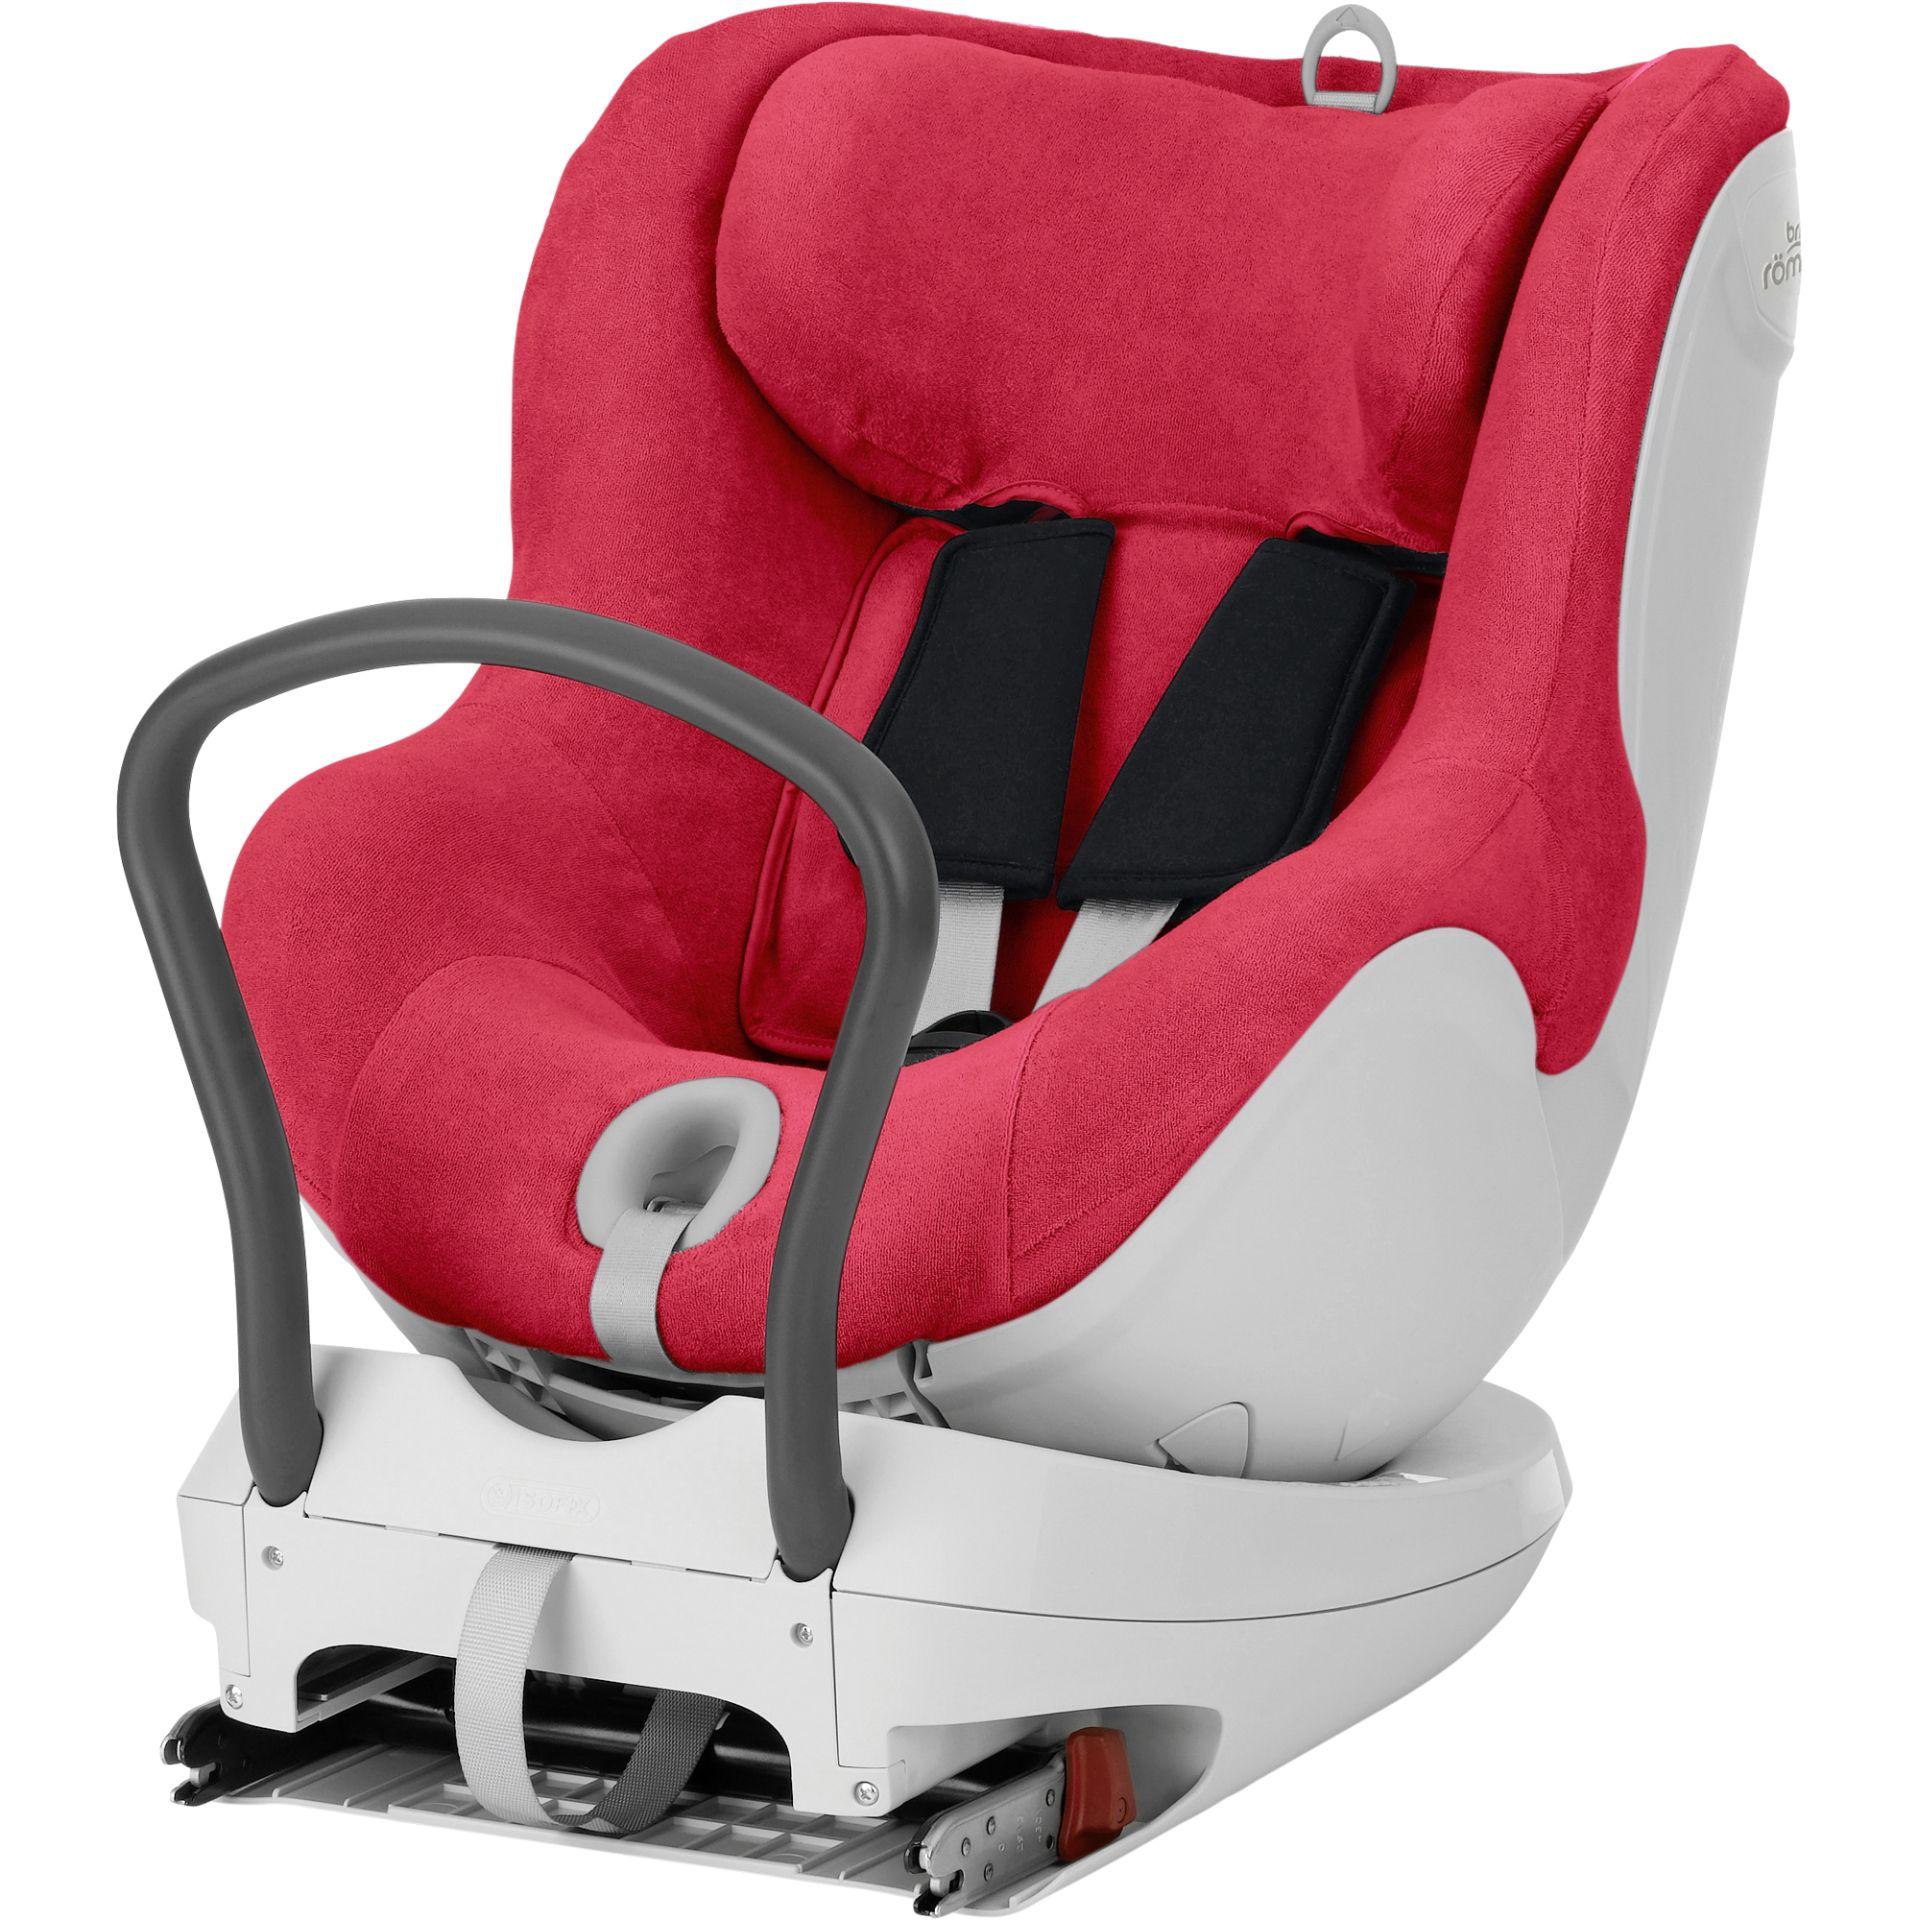 britax r mer summer cover for dualfix pink buy at kidsroom car seats car seat accessories. Black Bedroom Furniture Sets. Home Design Ideas